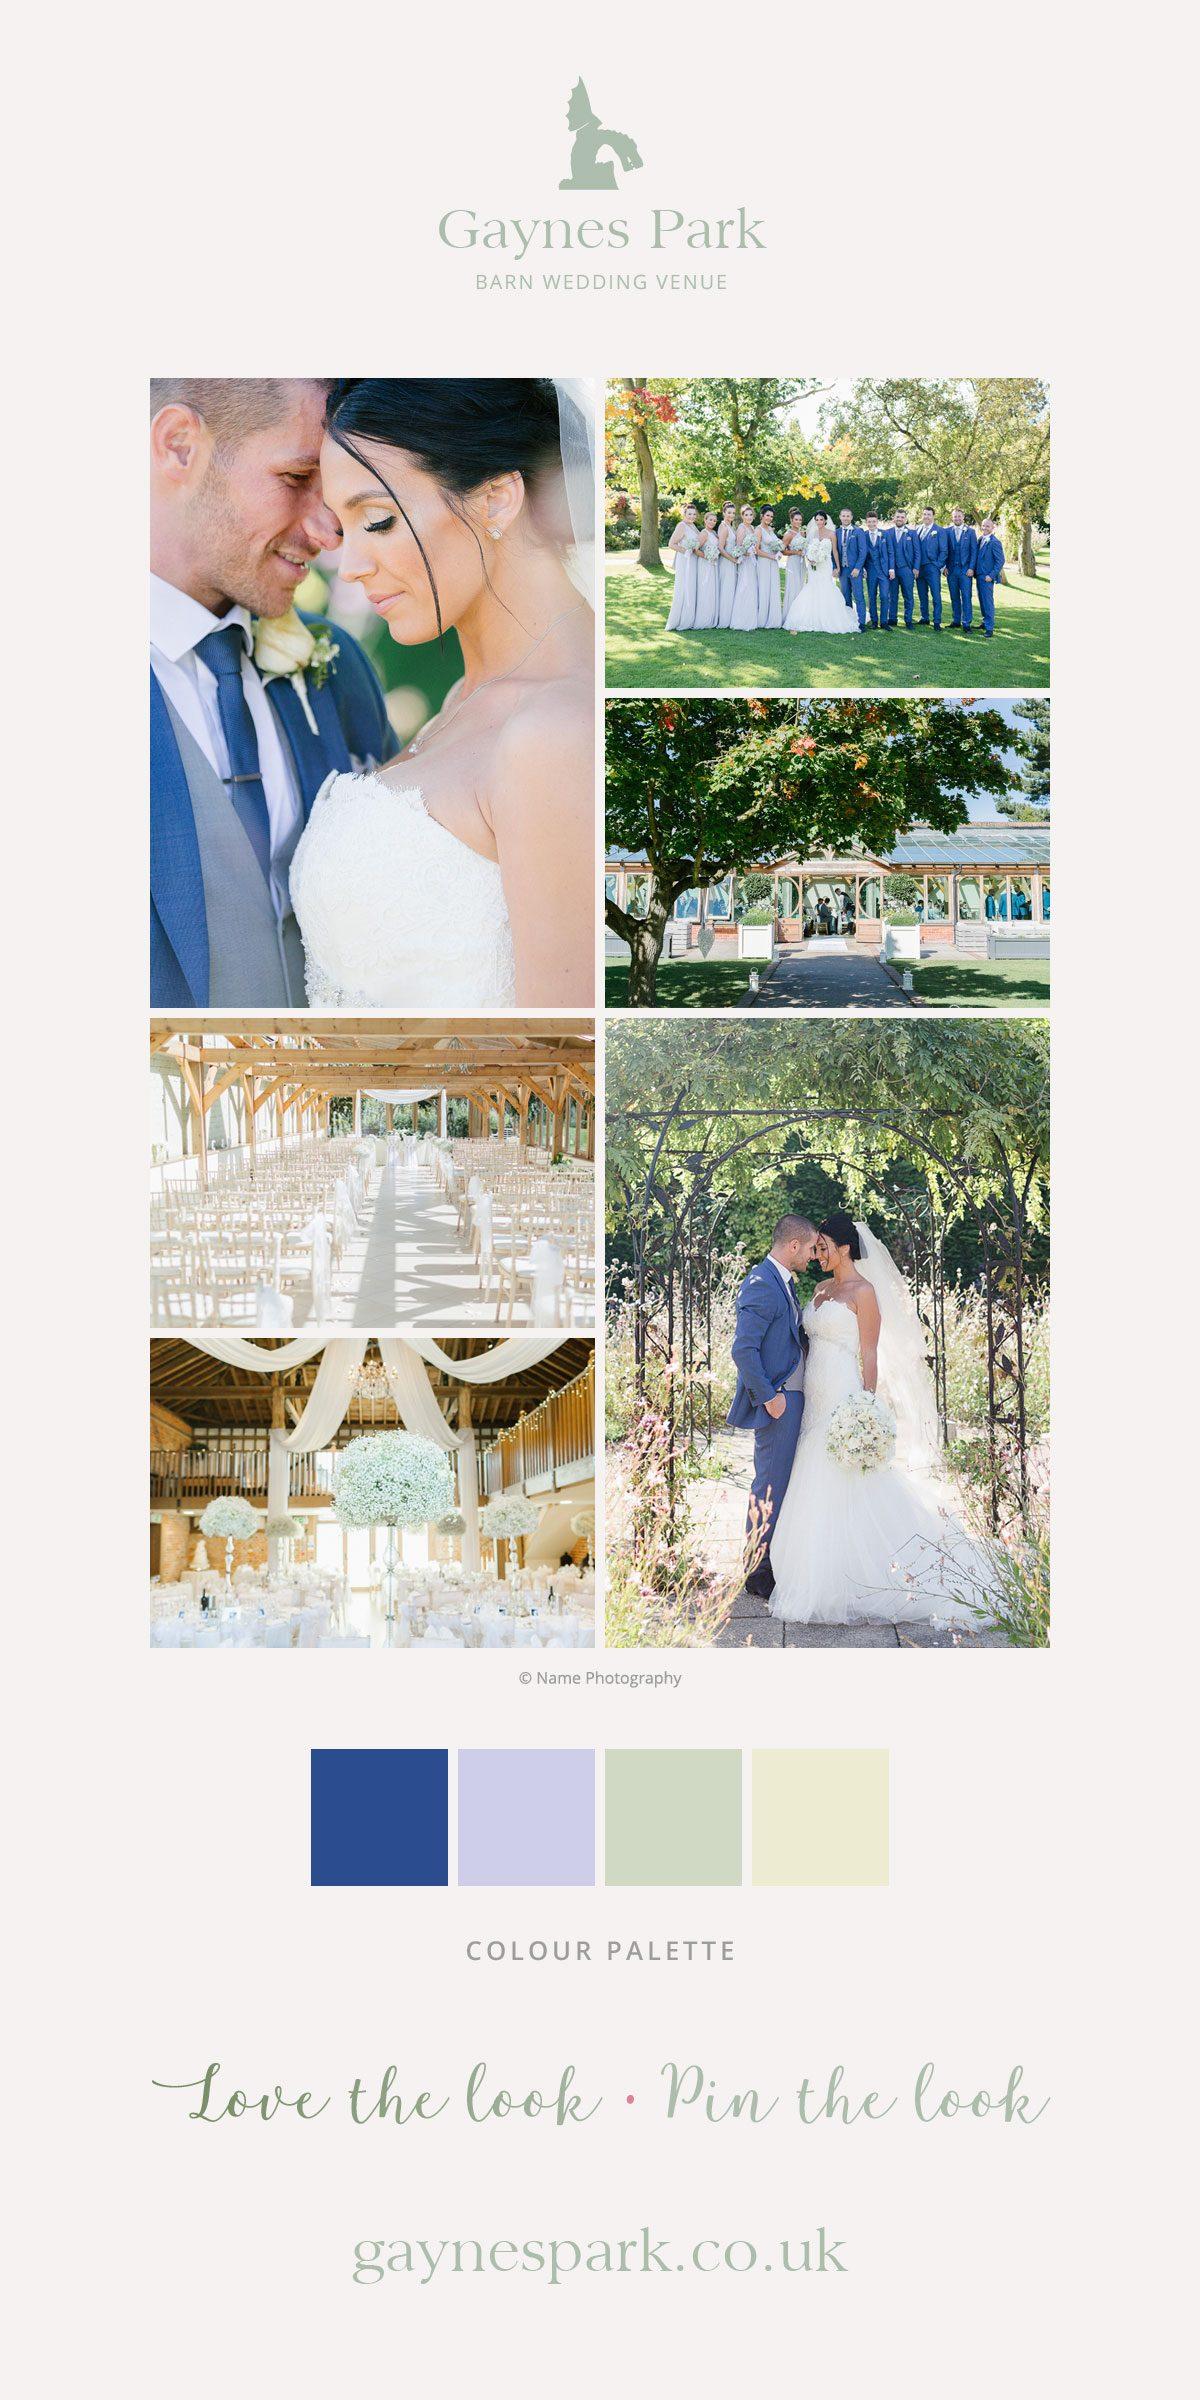 Danielle and Charley's real life wedding at Gaynes Park